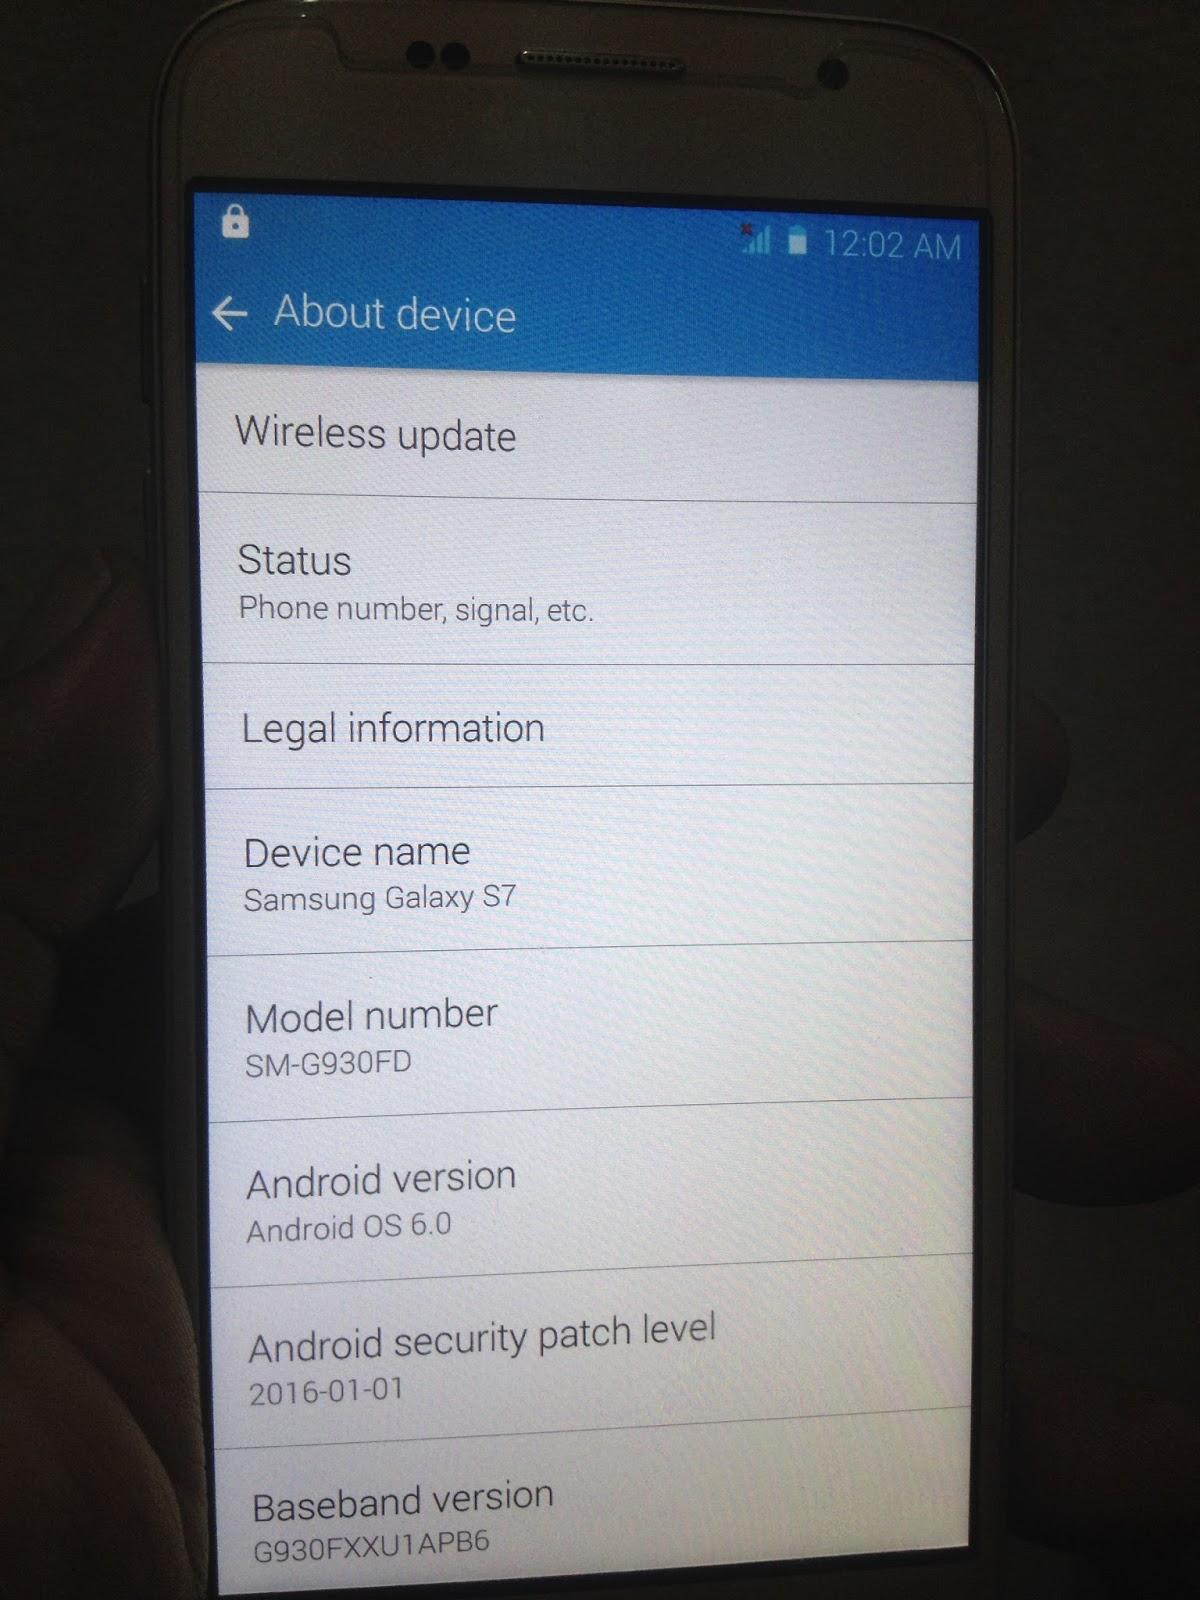 Samsung galaxy s7 model number sm-g930fd | Samsung Galaxy S7 Duos SM